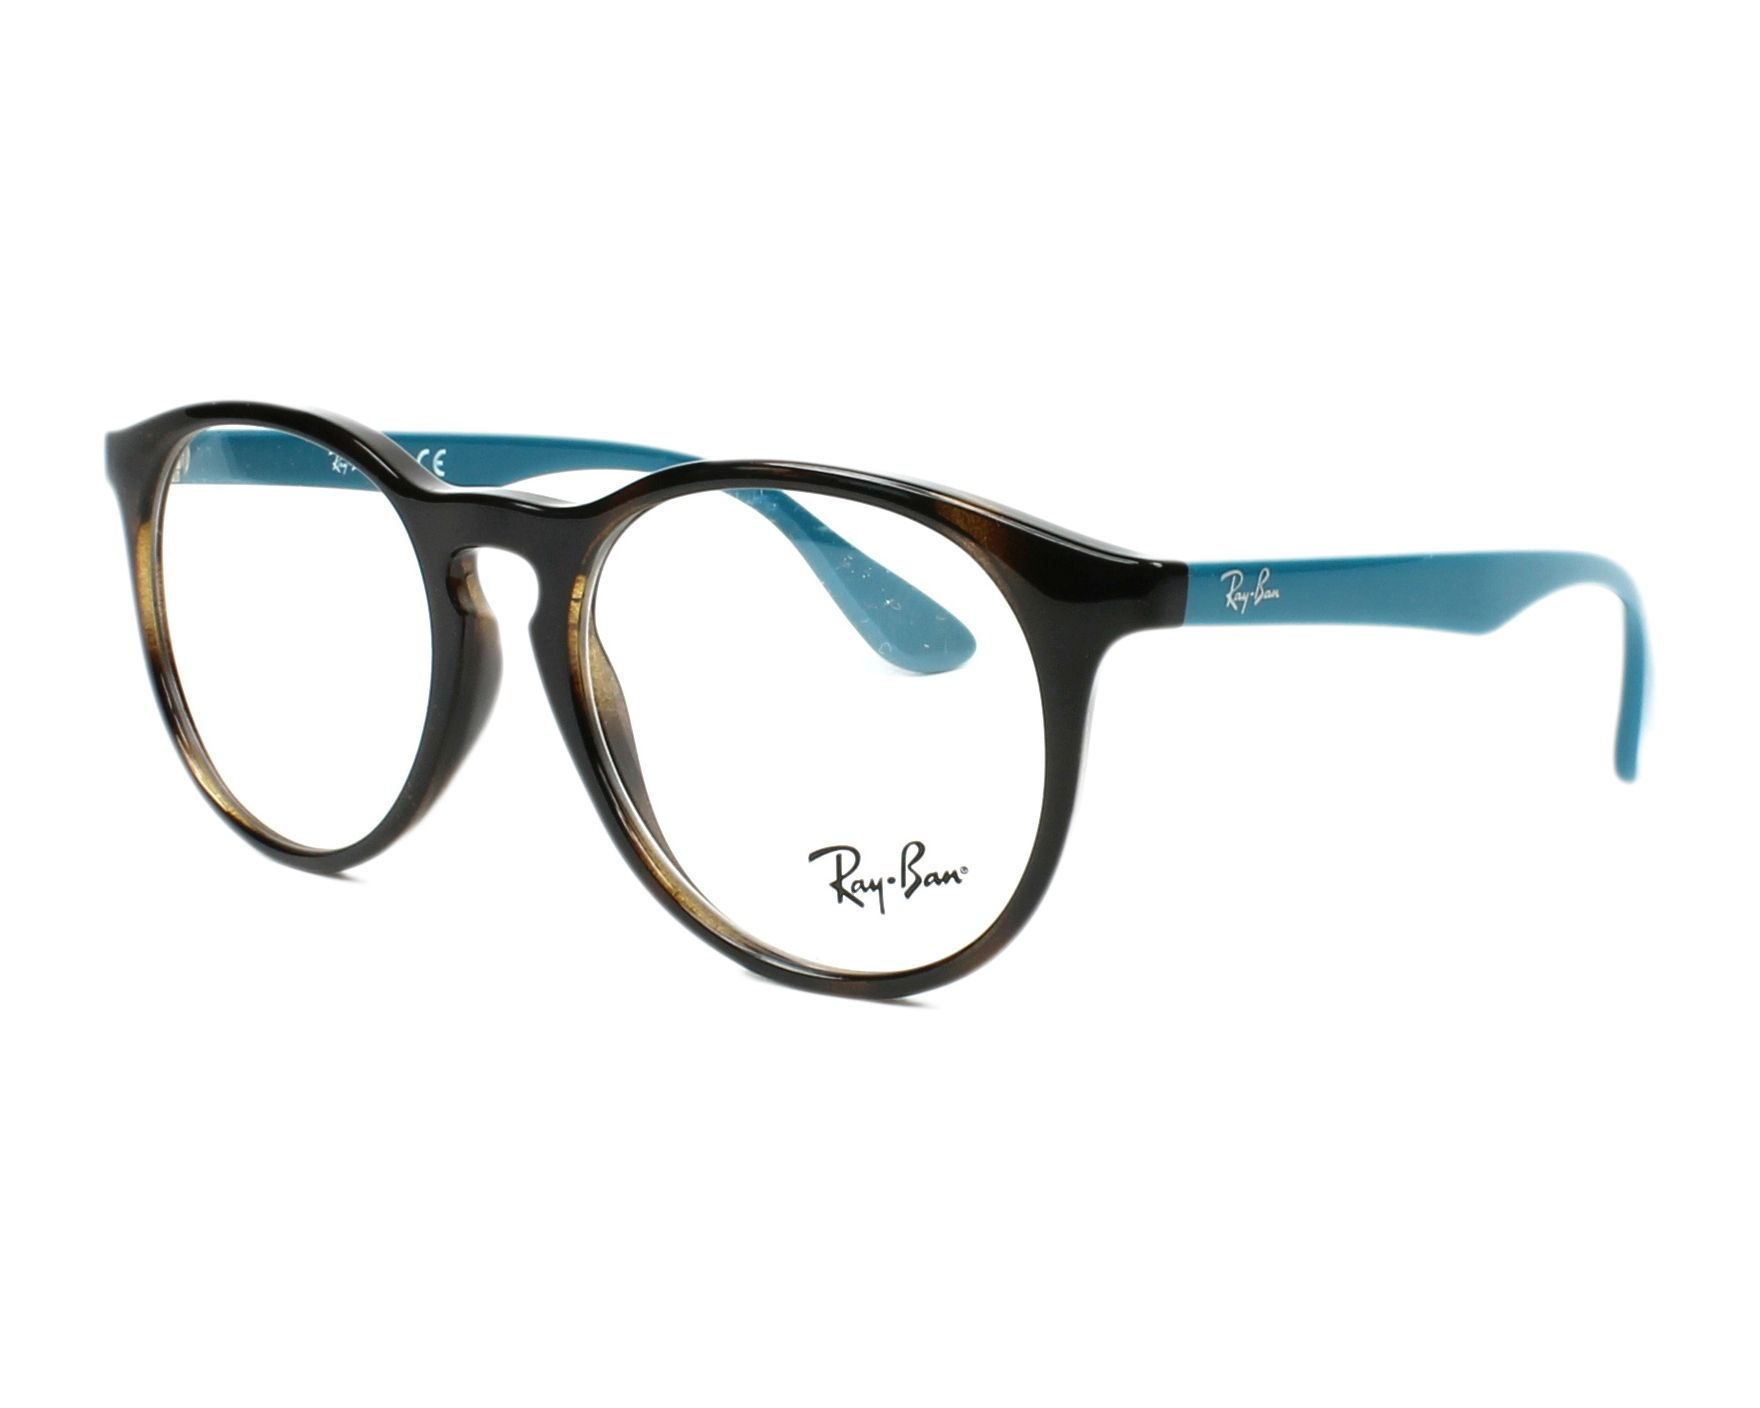 416836aefa eyeglasses Ray-Ban RY-1554 3728 48-16 Havana Turquoise profile view